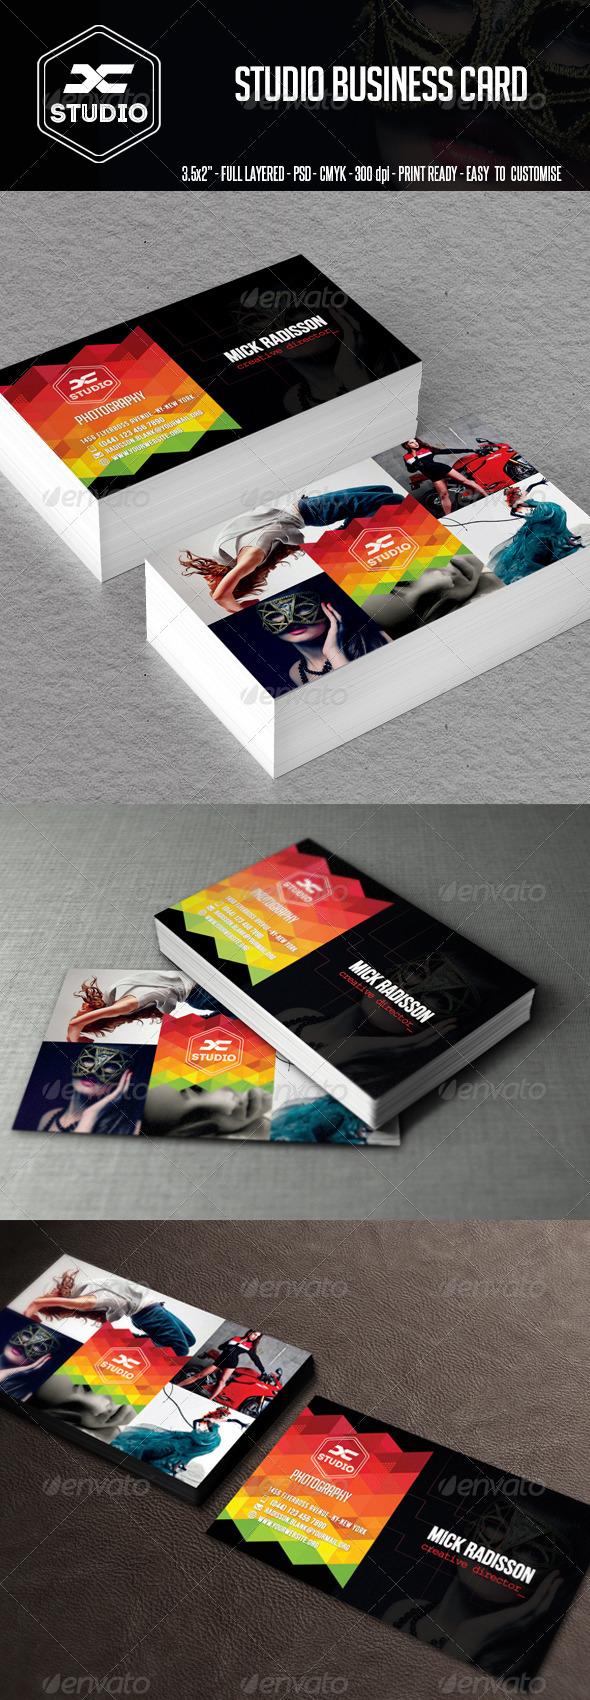 Studio Business Card - Creative Business Cards